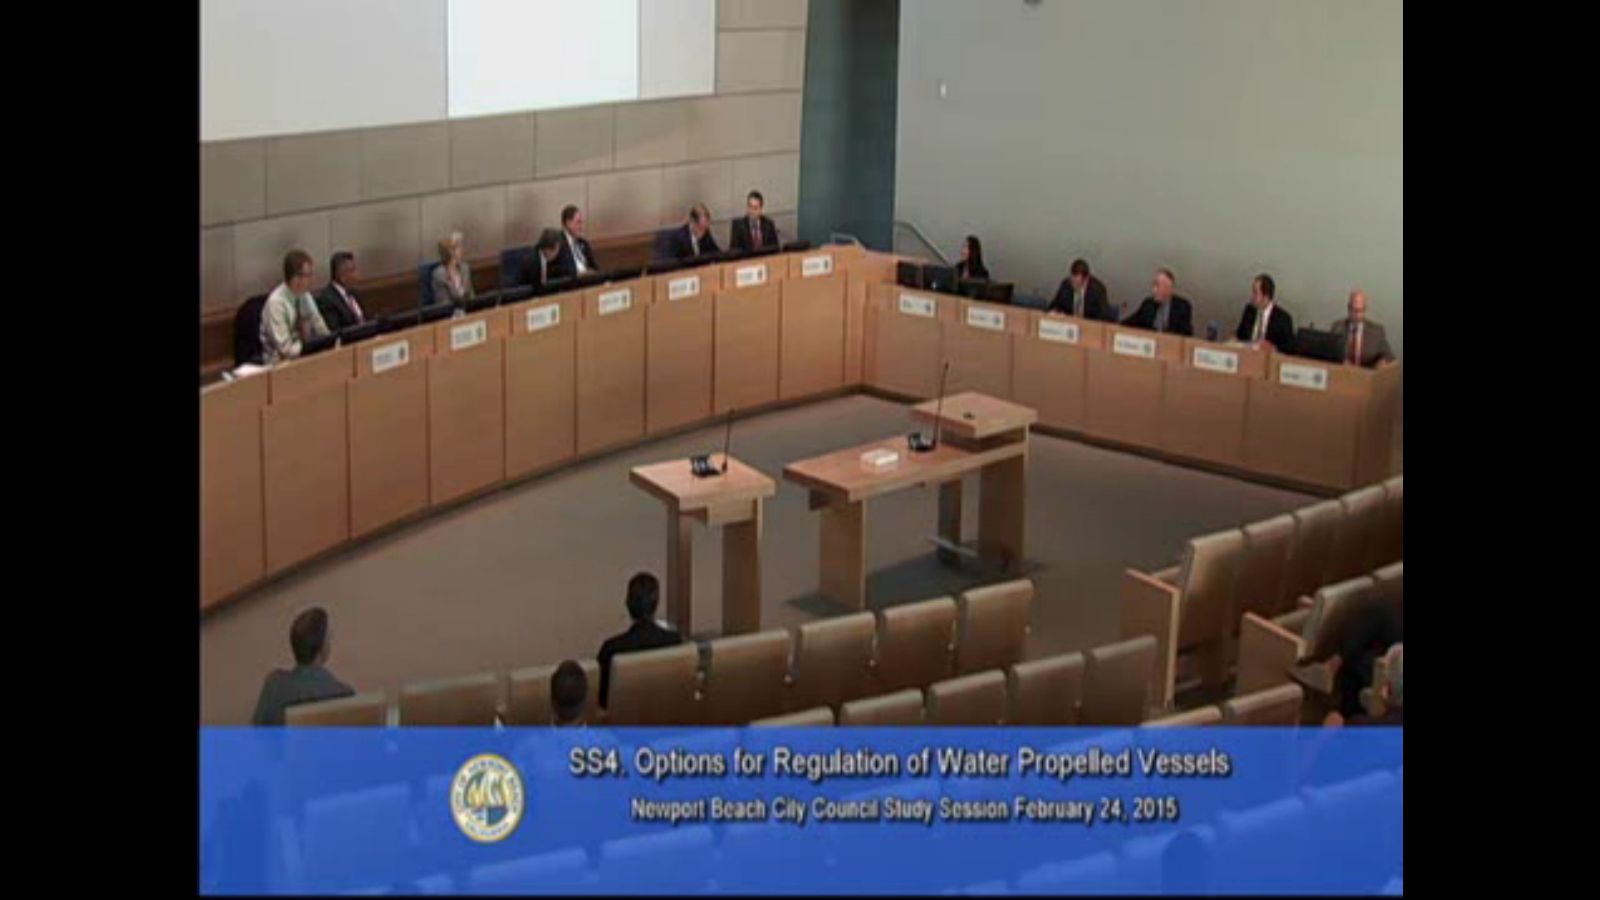 City Council Hydroflight Regulation